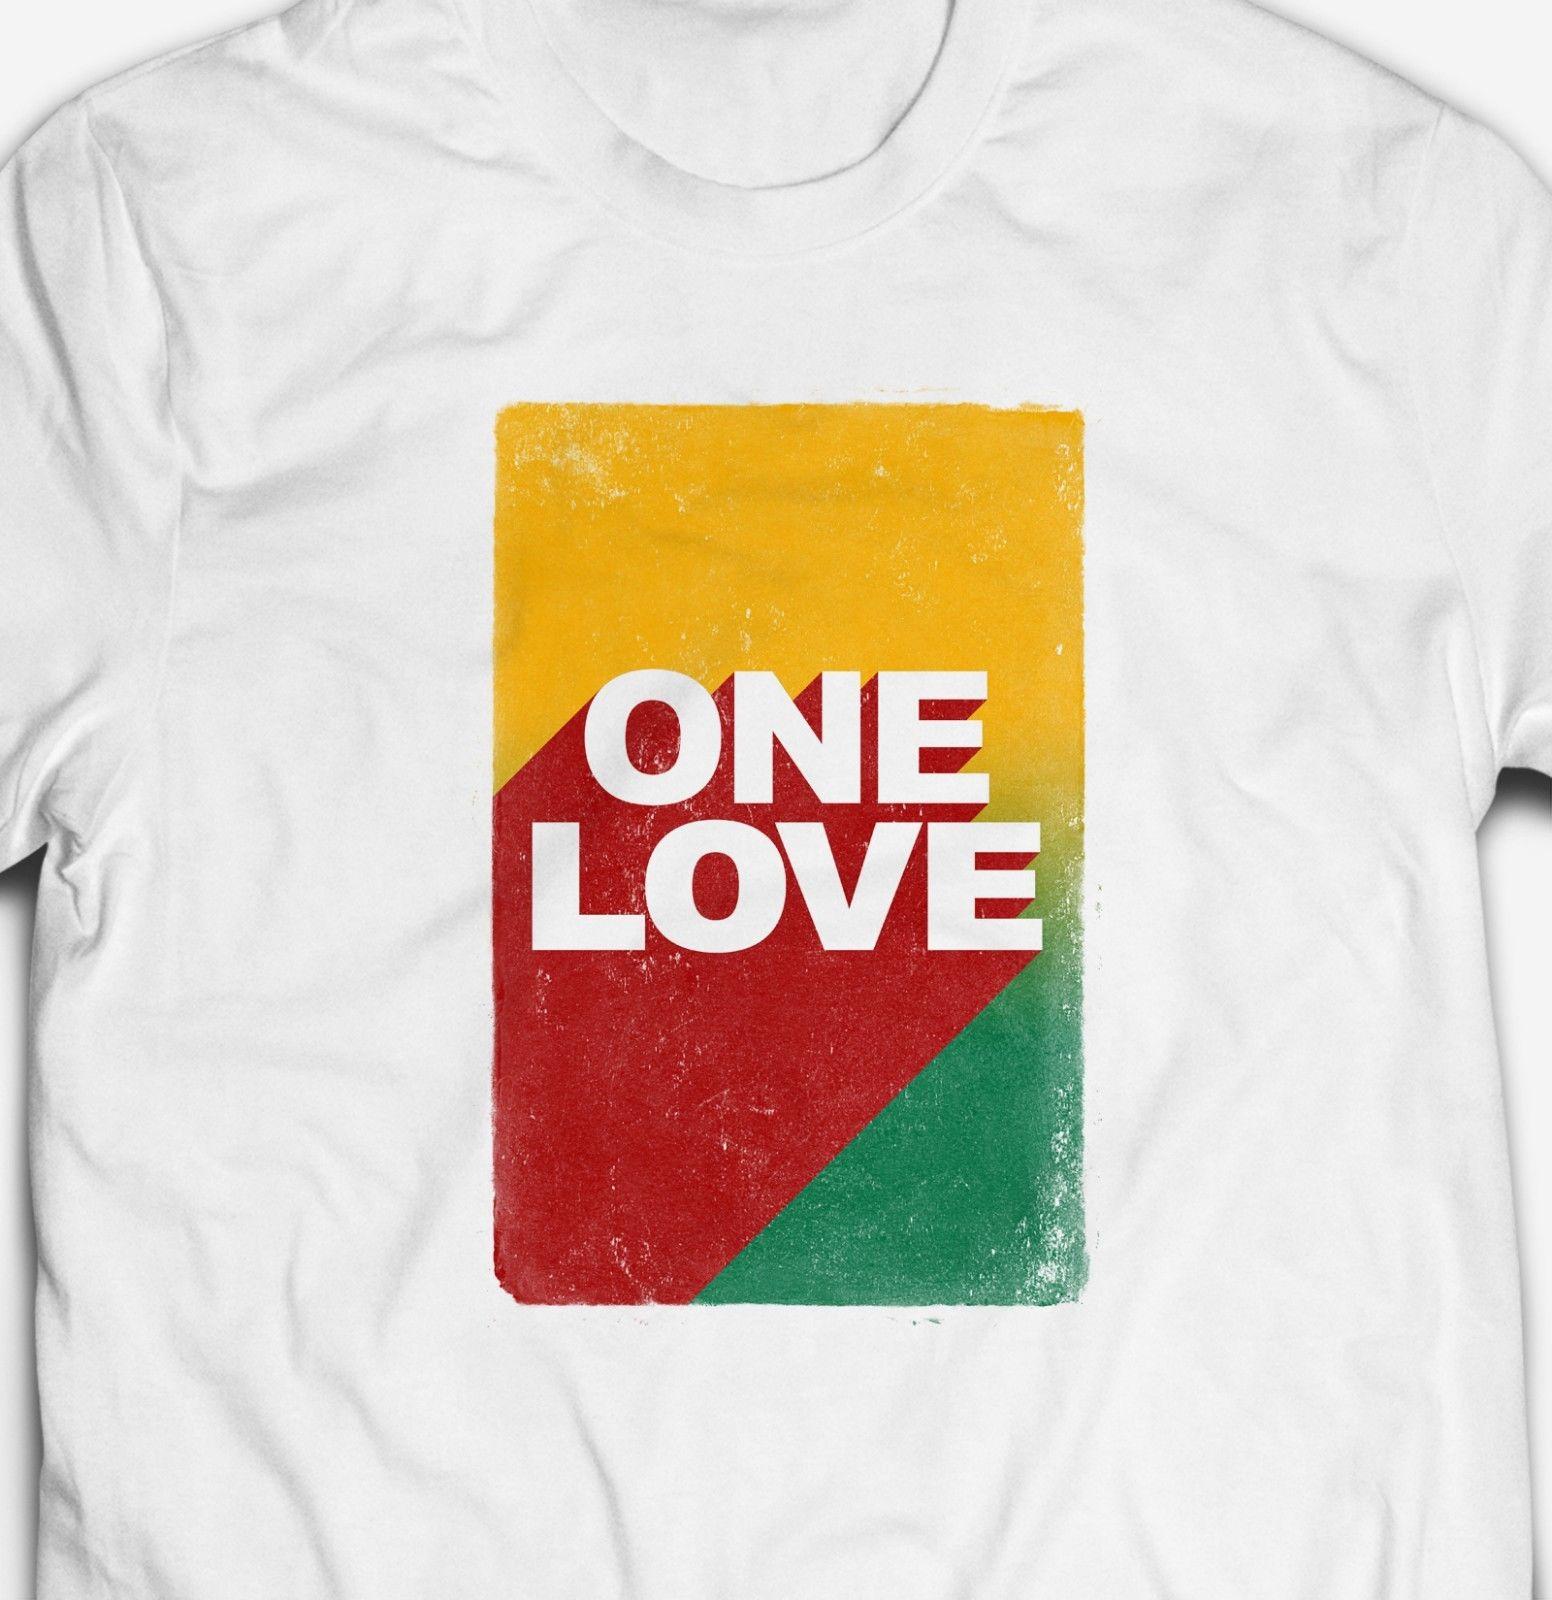 Camiseta para hombre de algodón con 100% de música DUB de jamaiquino un amor REGGAE RASTA de jamaiquina